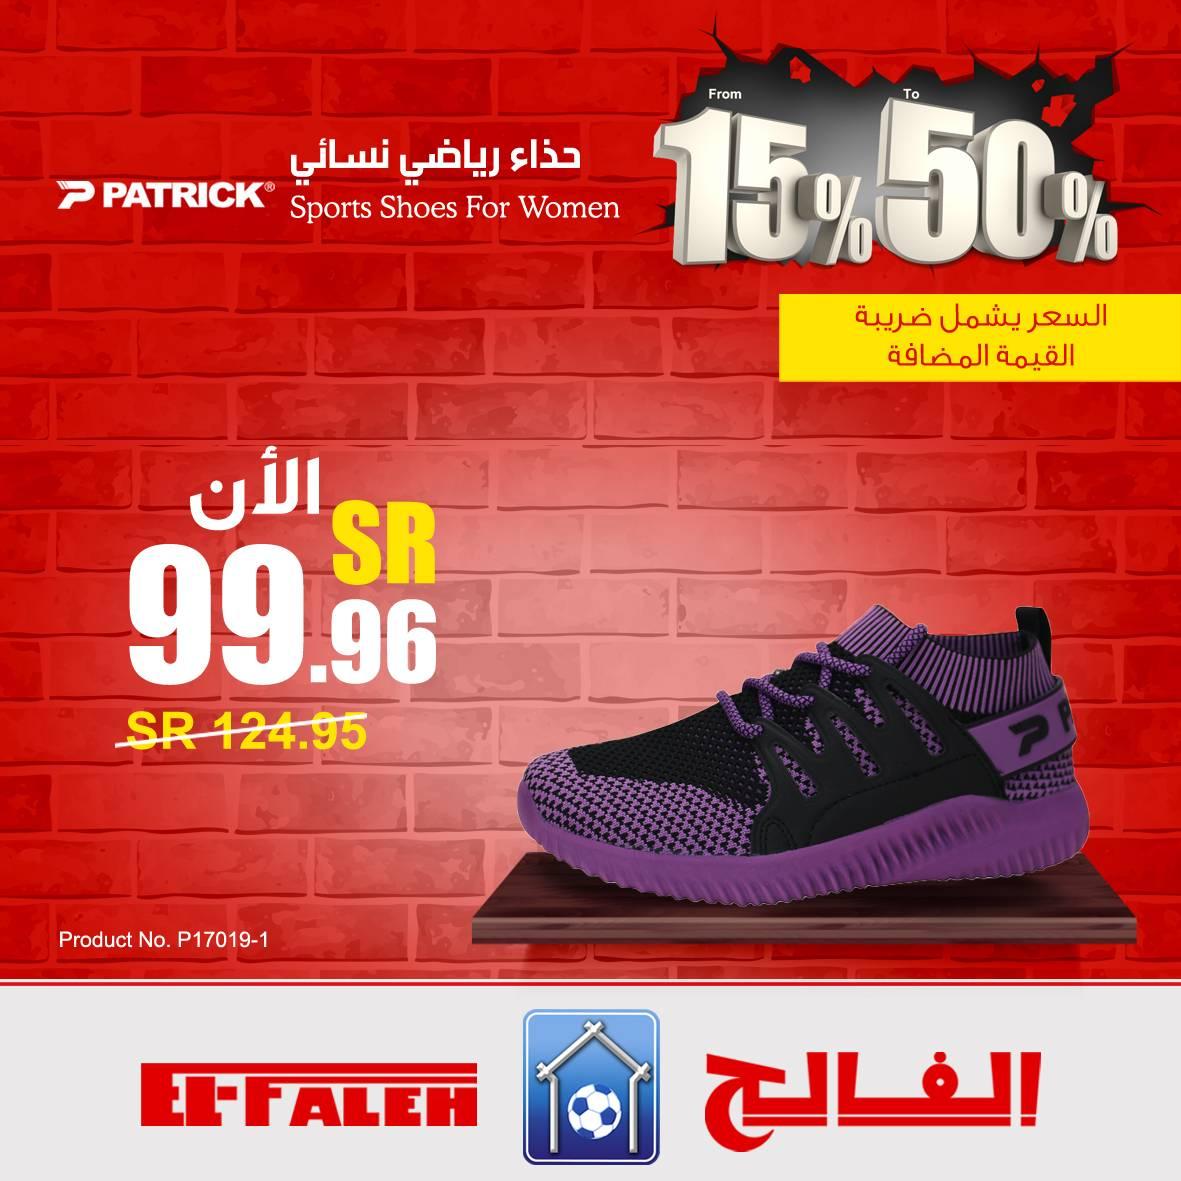 930a21f77 بيت الرياضة الفالح on Twitter: